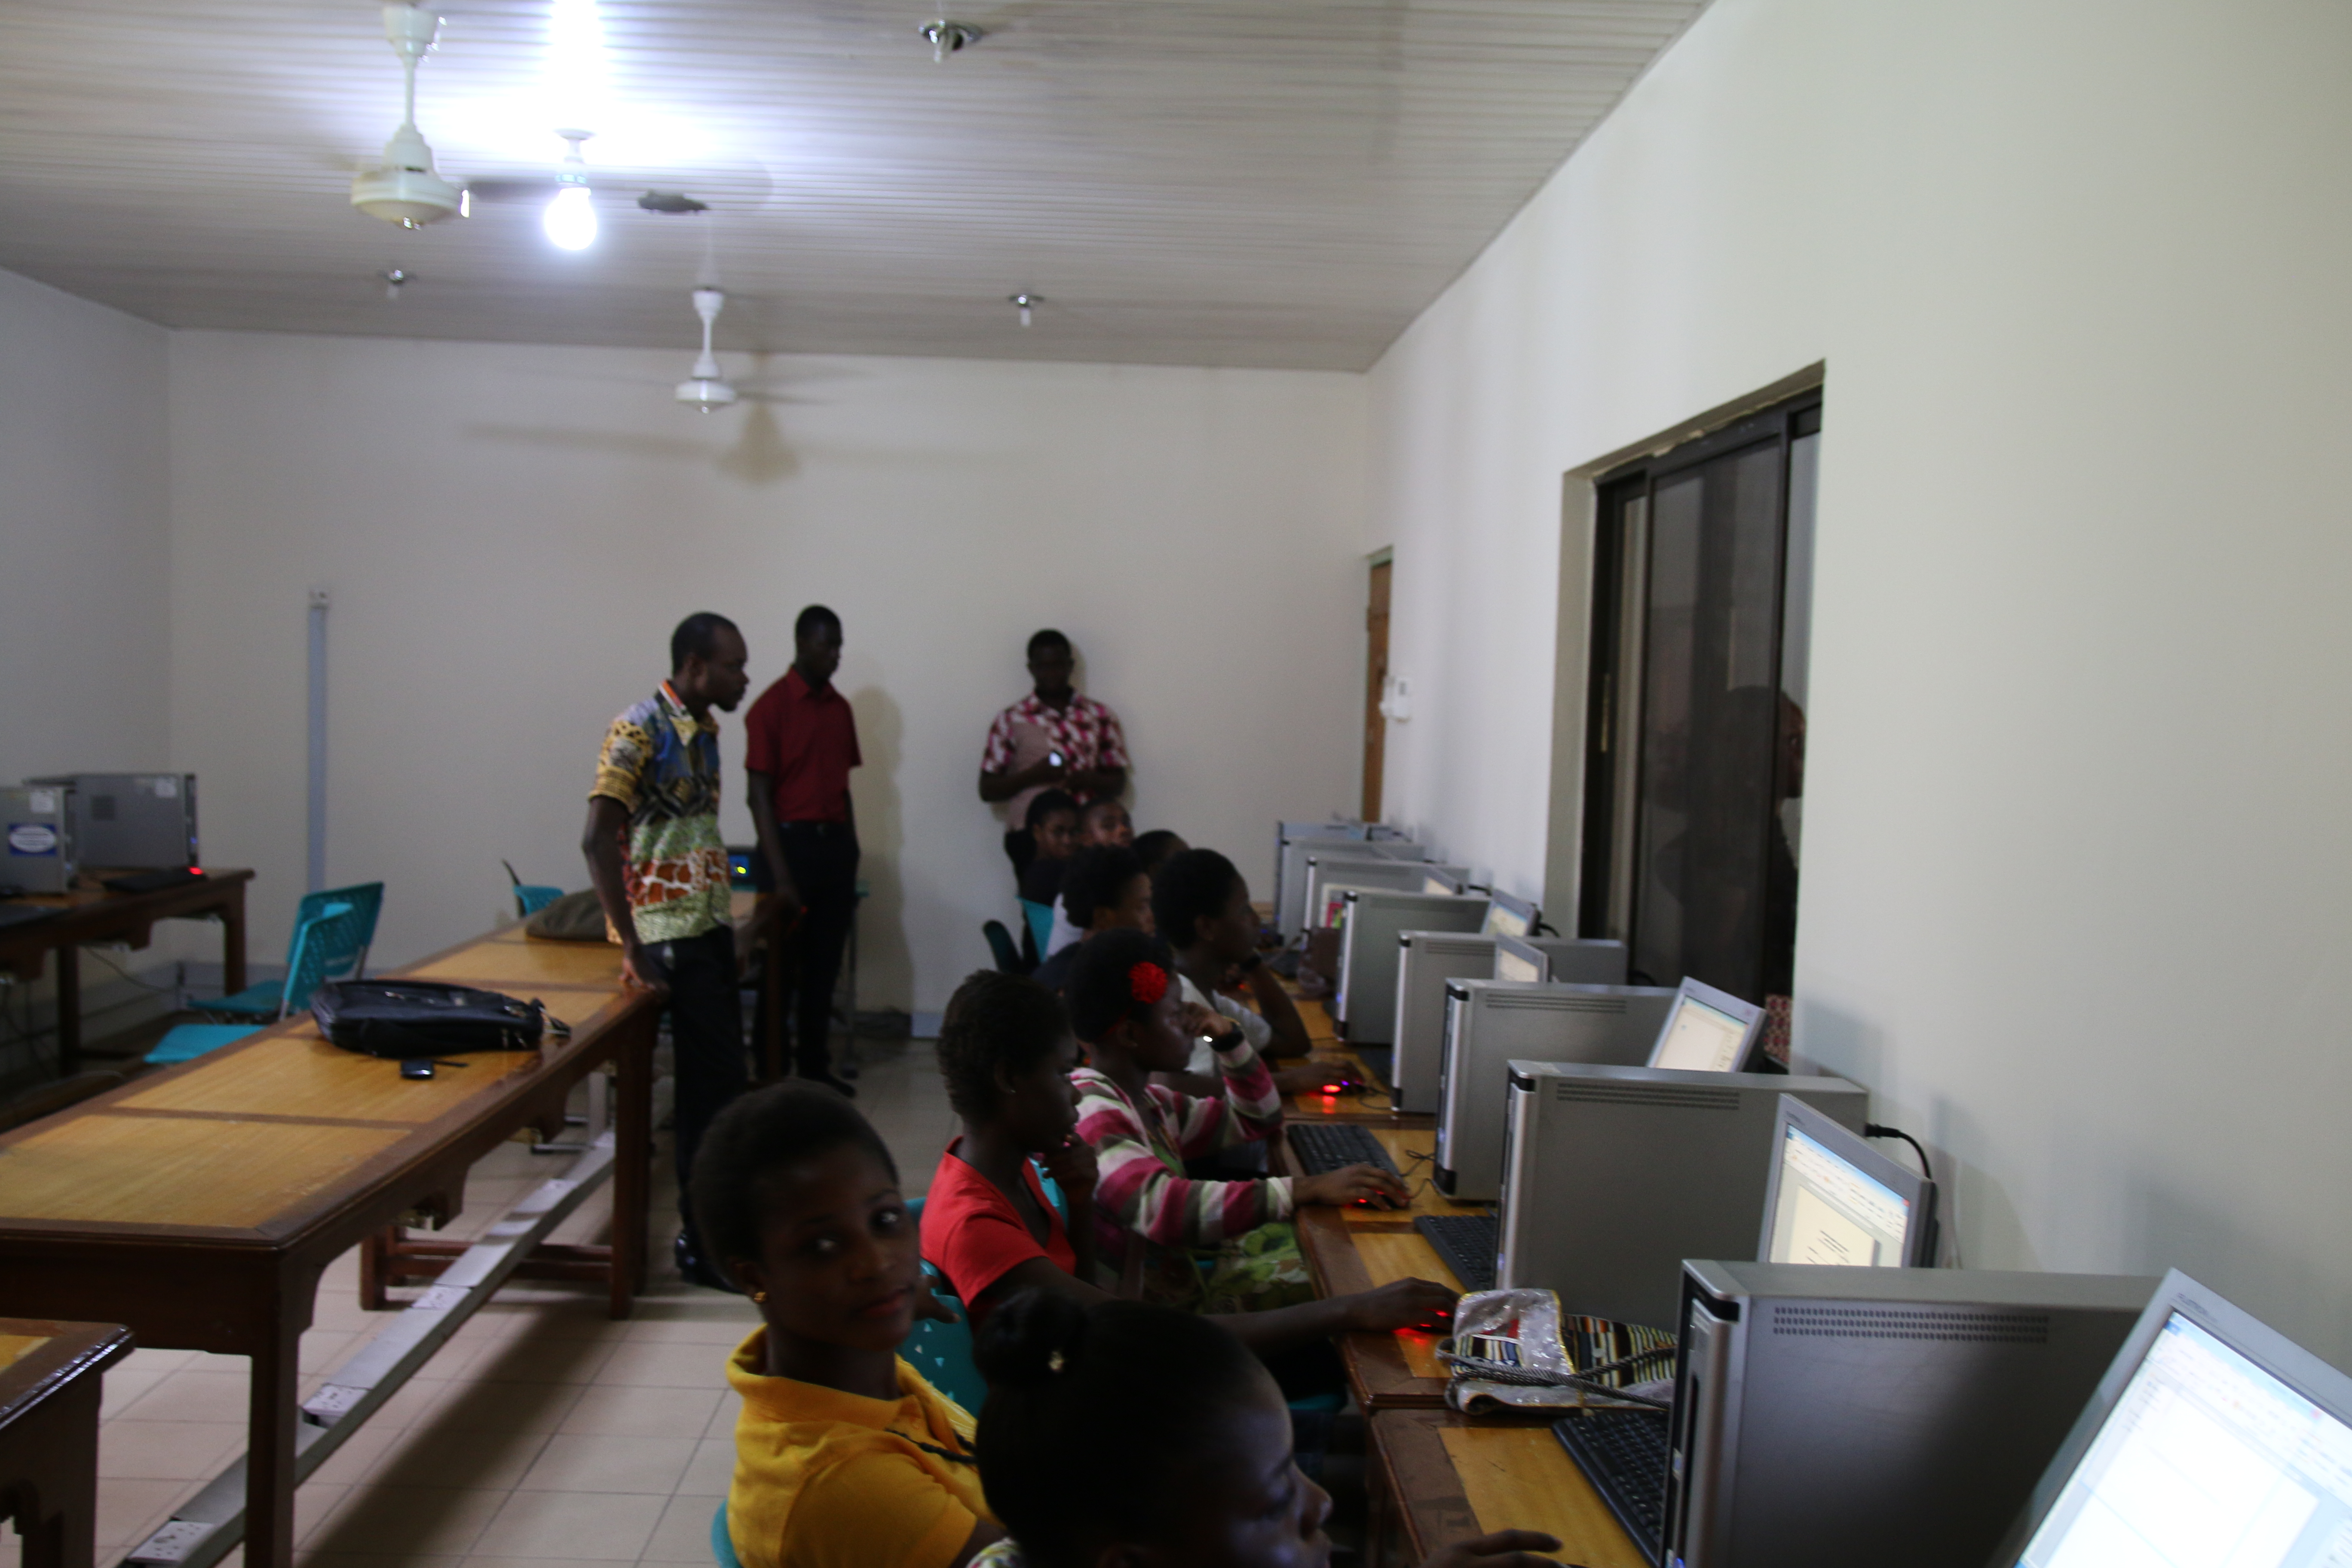 The Ghana Korea Germany Church Mission Computer Training School GKGCM In Akosombo Volta Region It Is A Trilateral Project Of Presbyterian